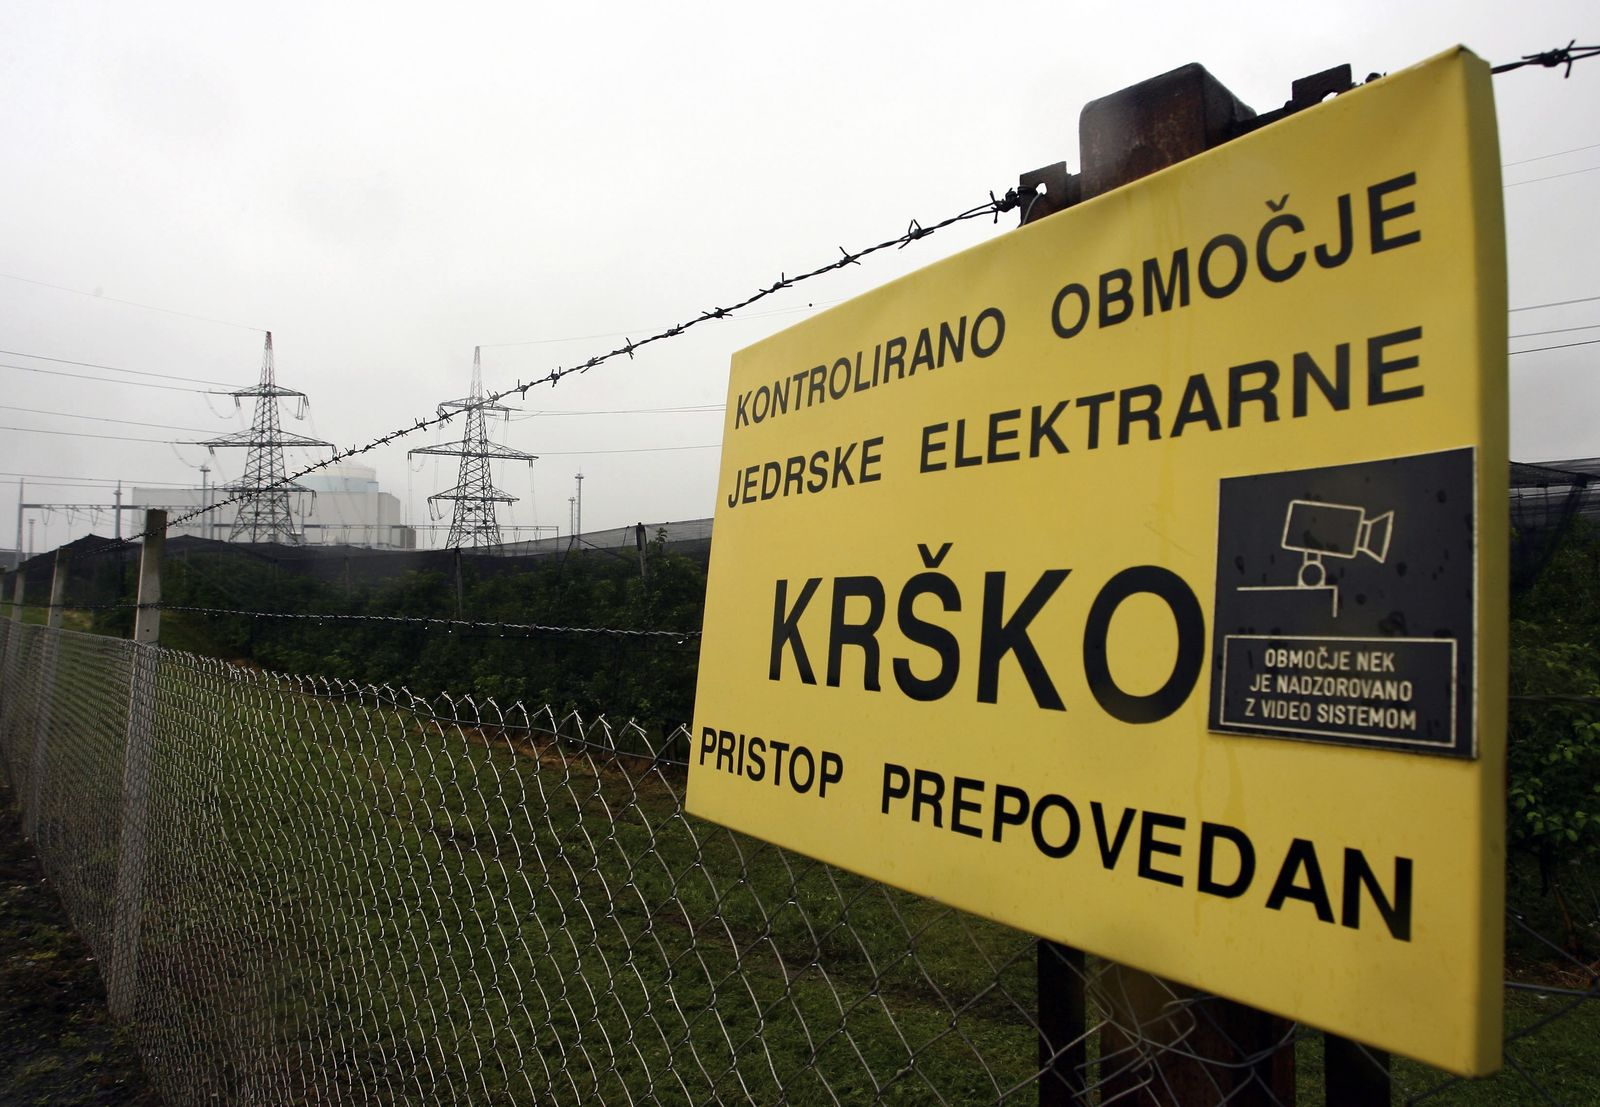 Krsko / AKW / Slowenien